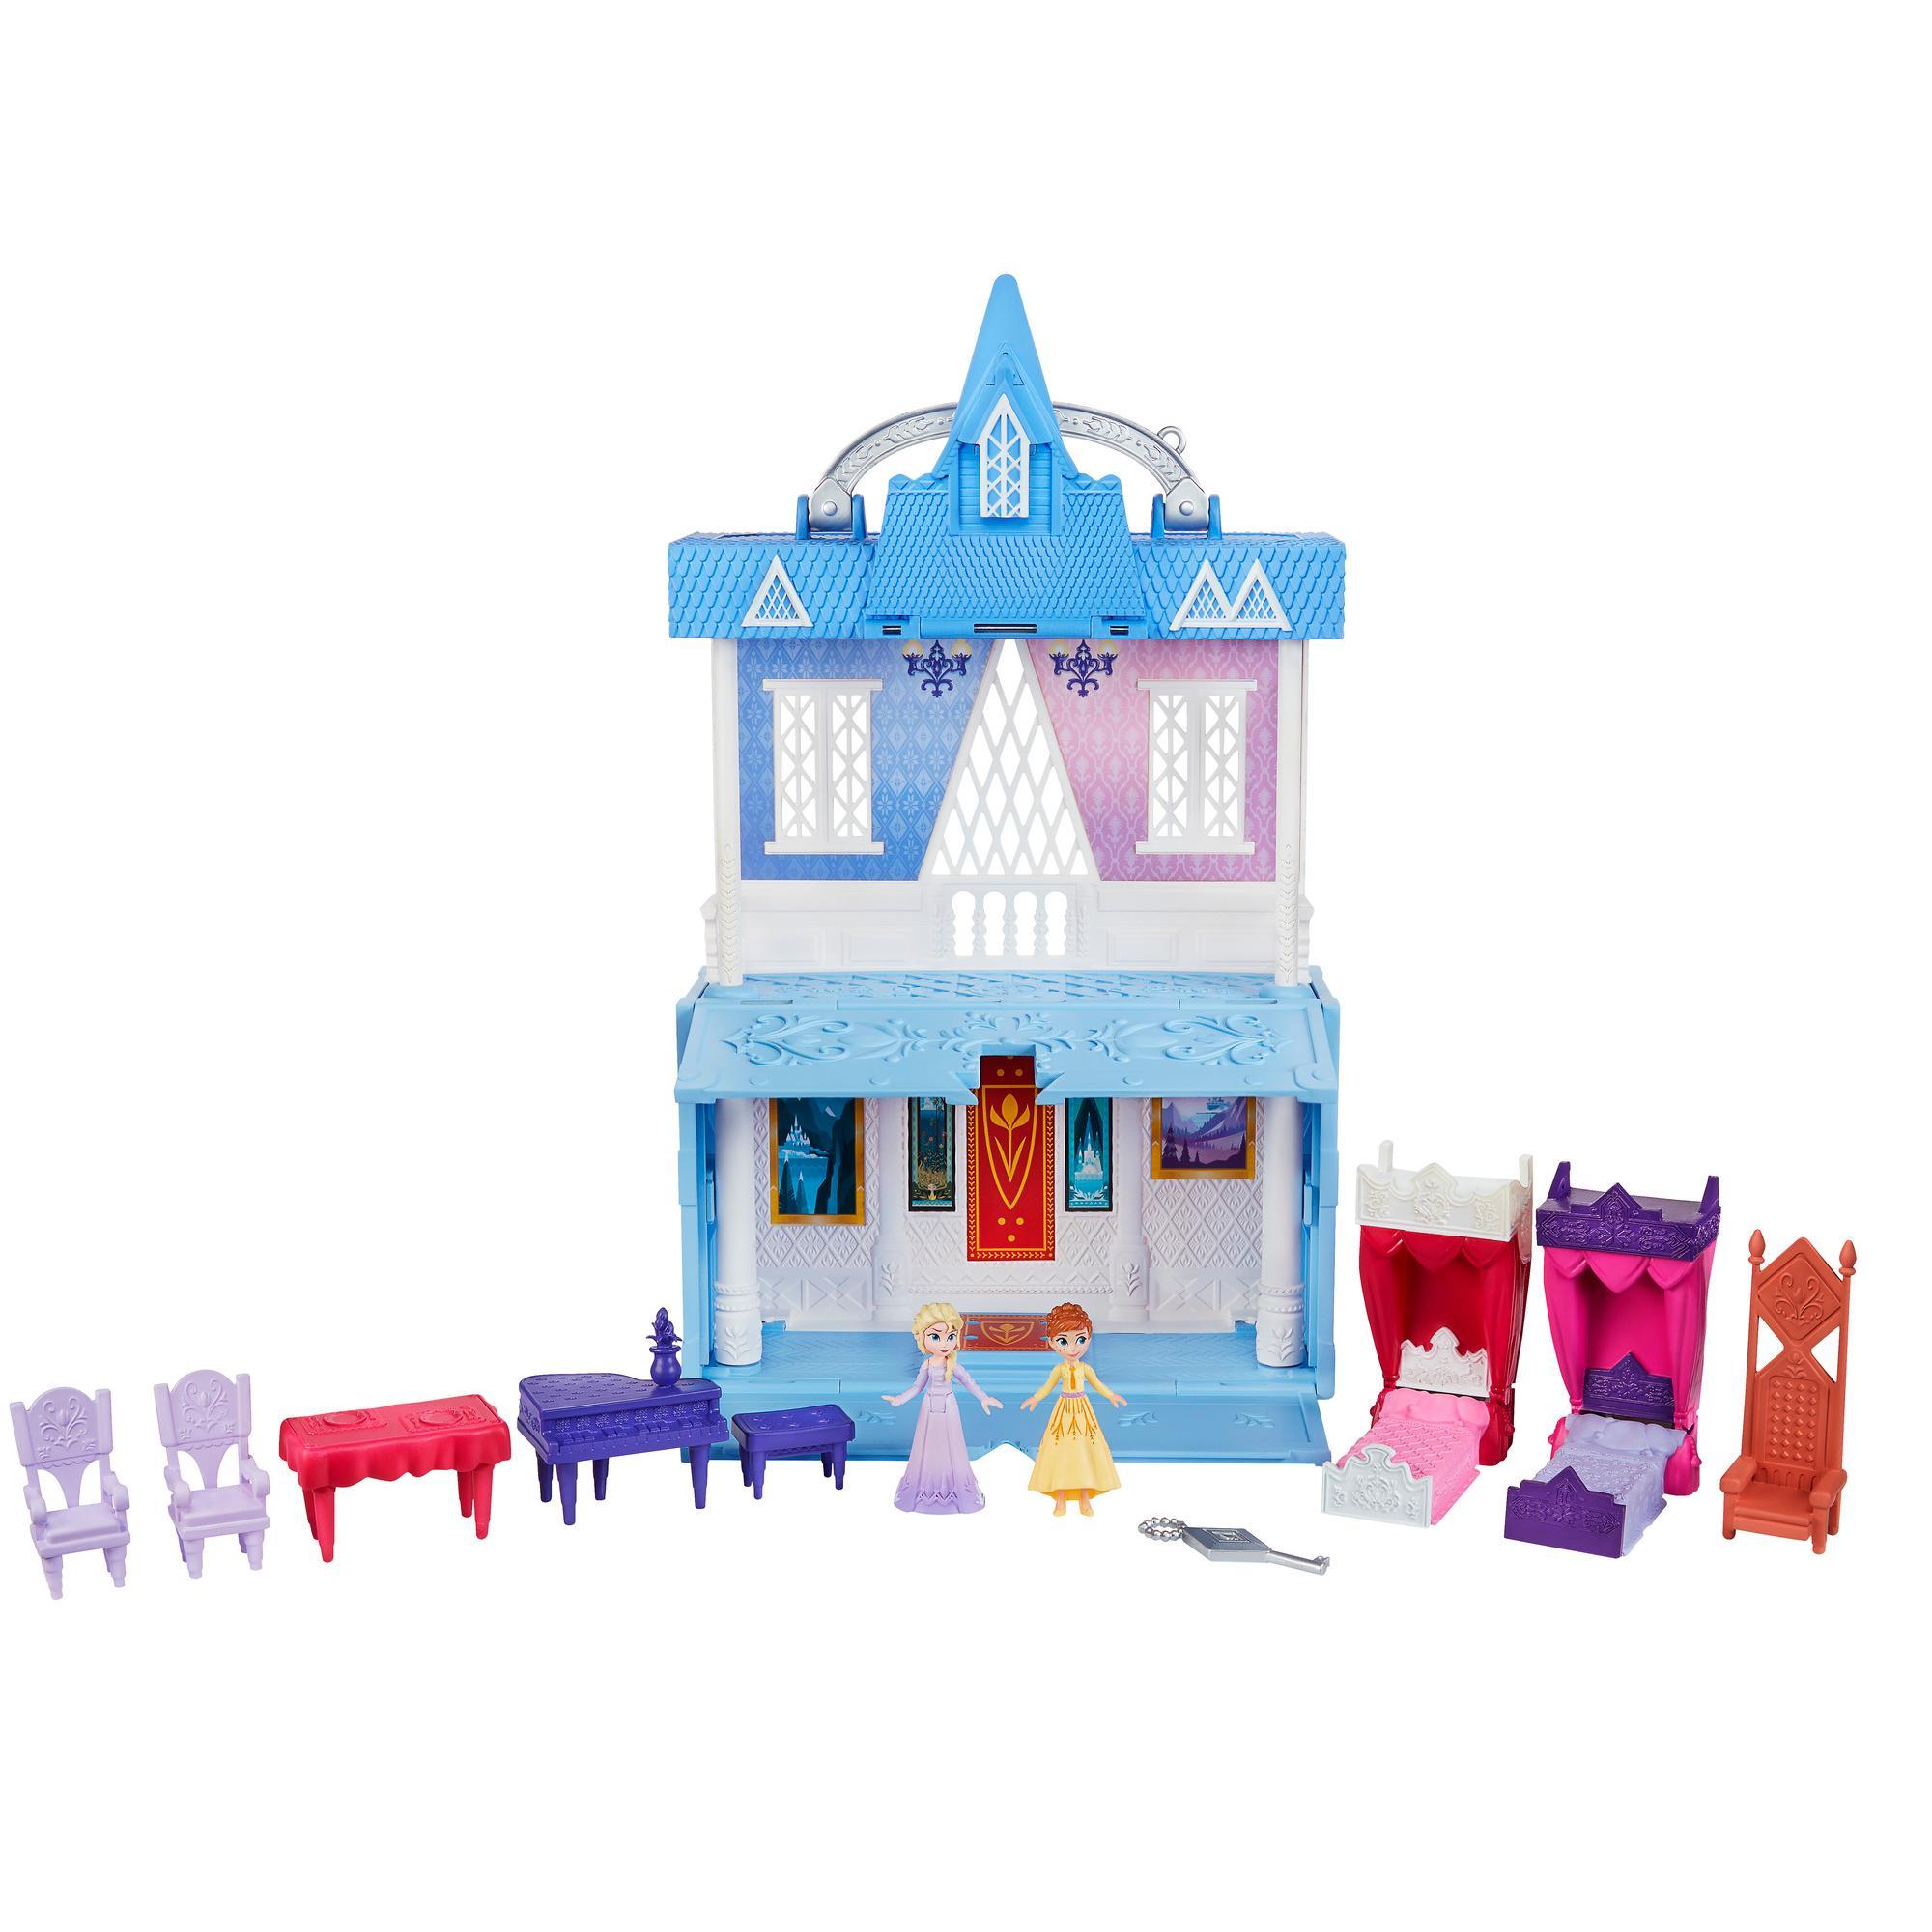 FRZ 2 -  Pop up - Mini château